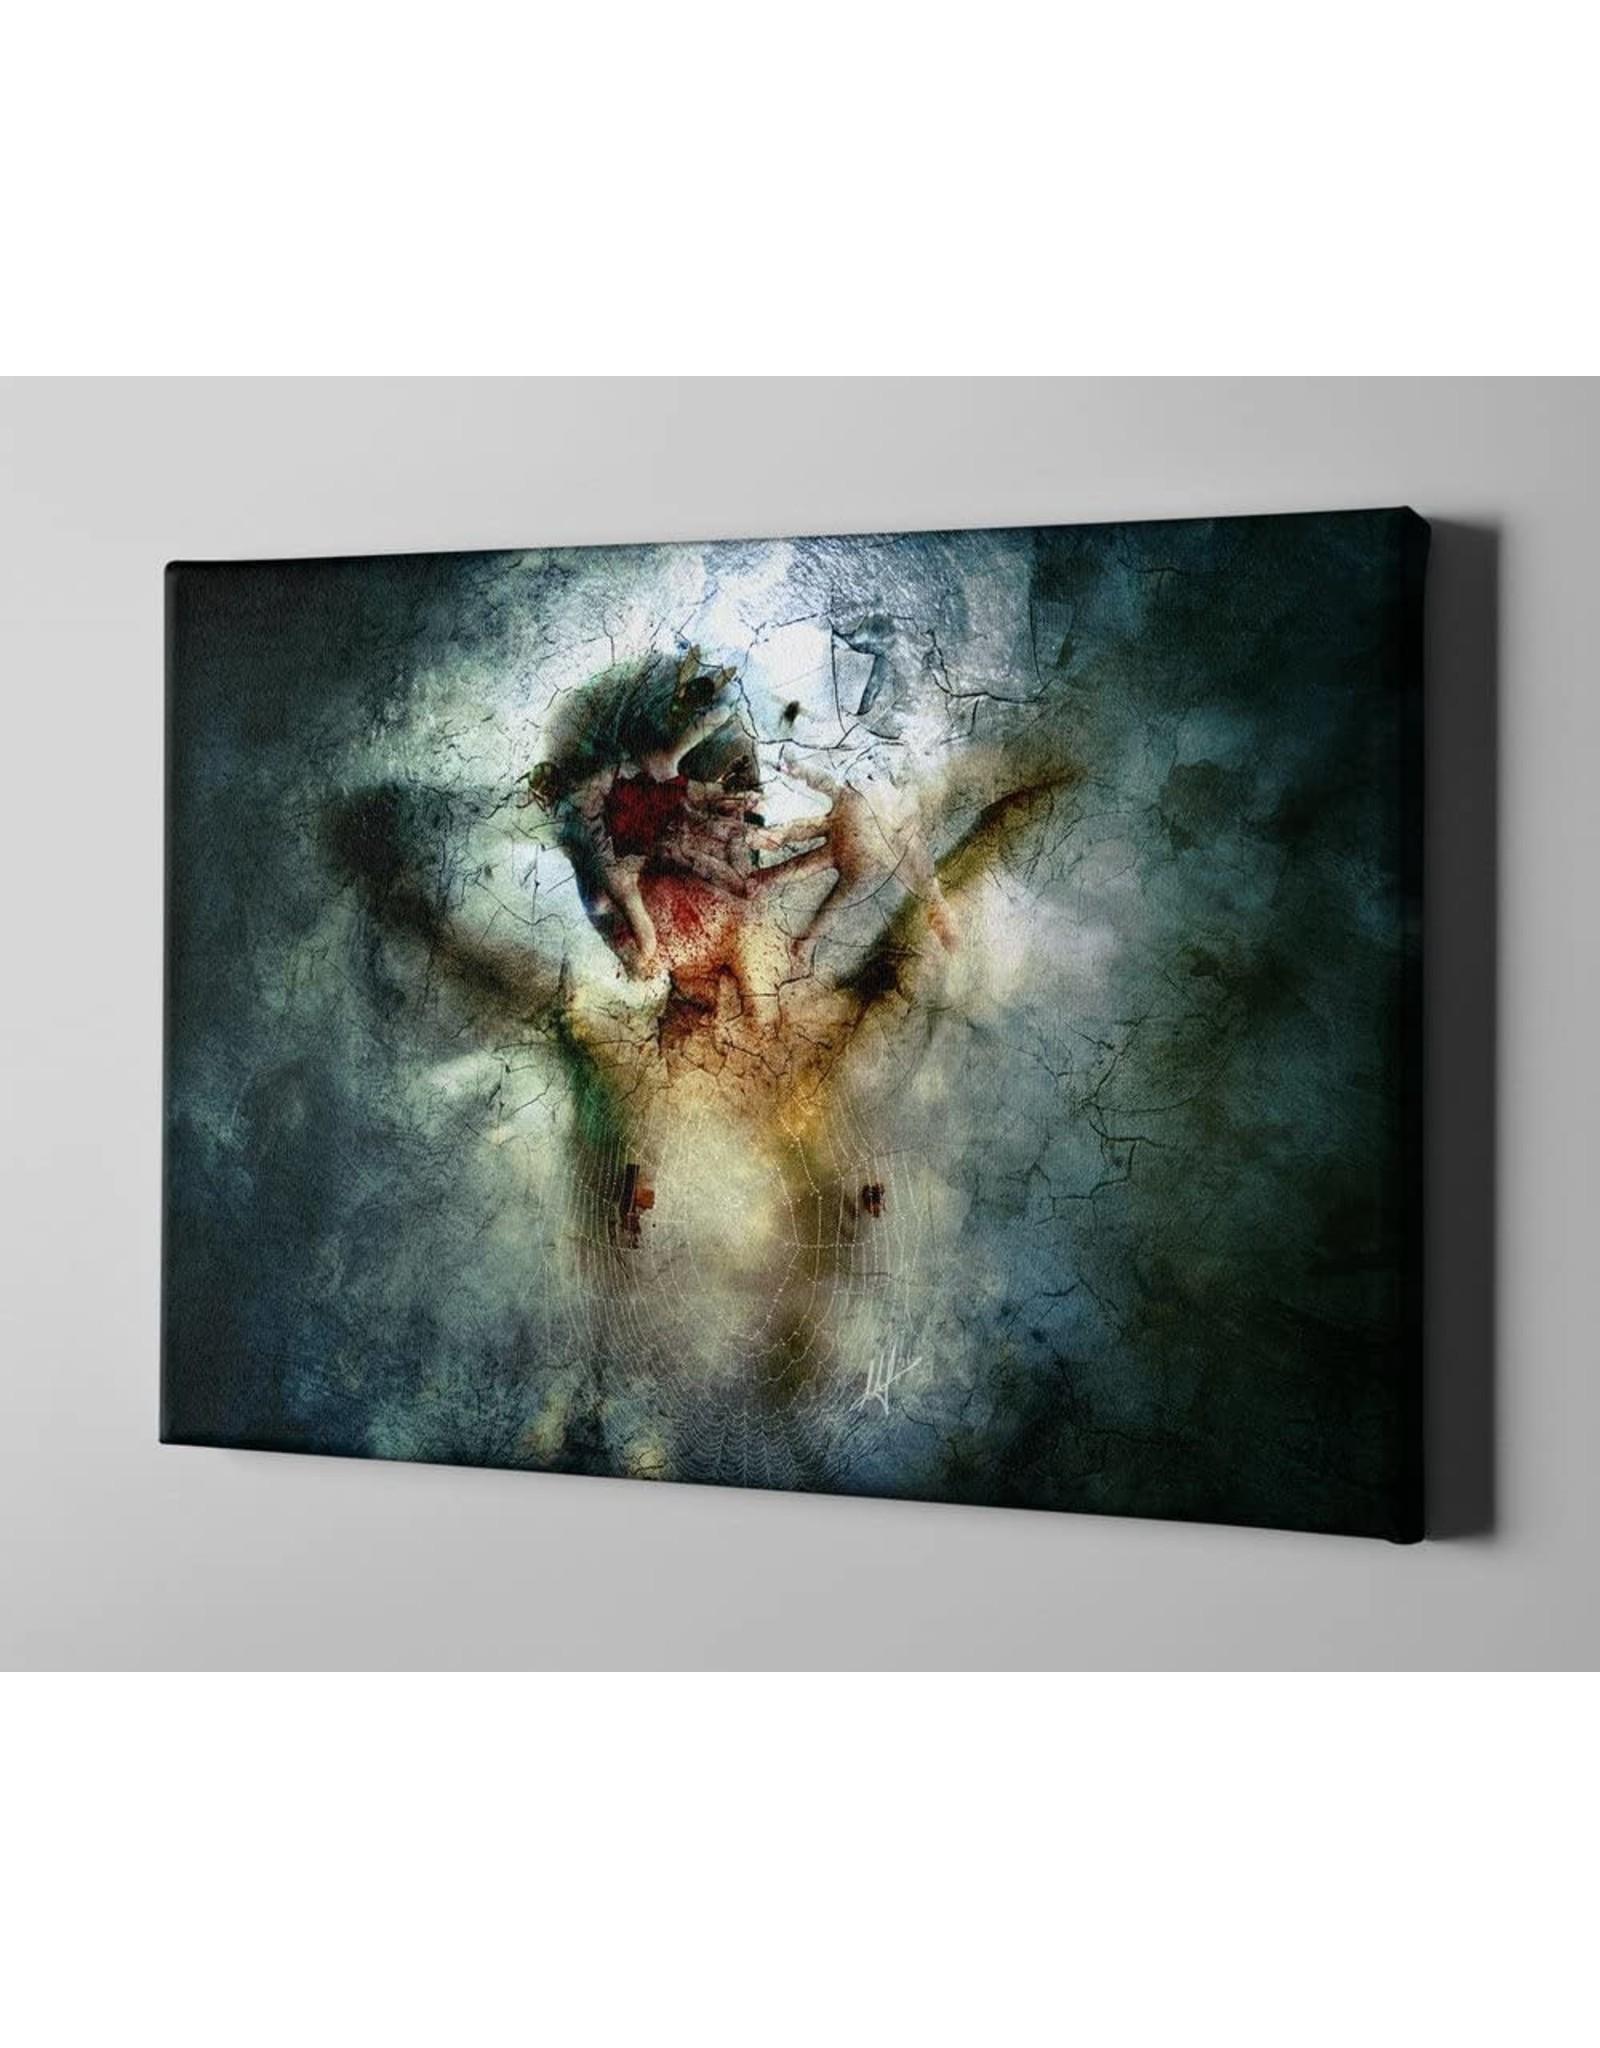 "Cortesi Home Cortesi Home I Break by Mario Sanchez Nevado Giclee Canvas Wall Art, 40"" x 60"", Green"